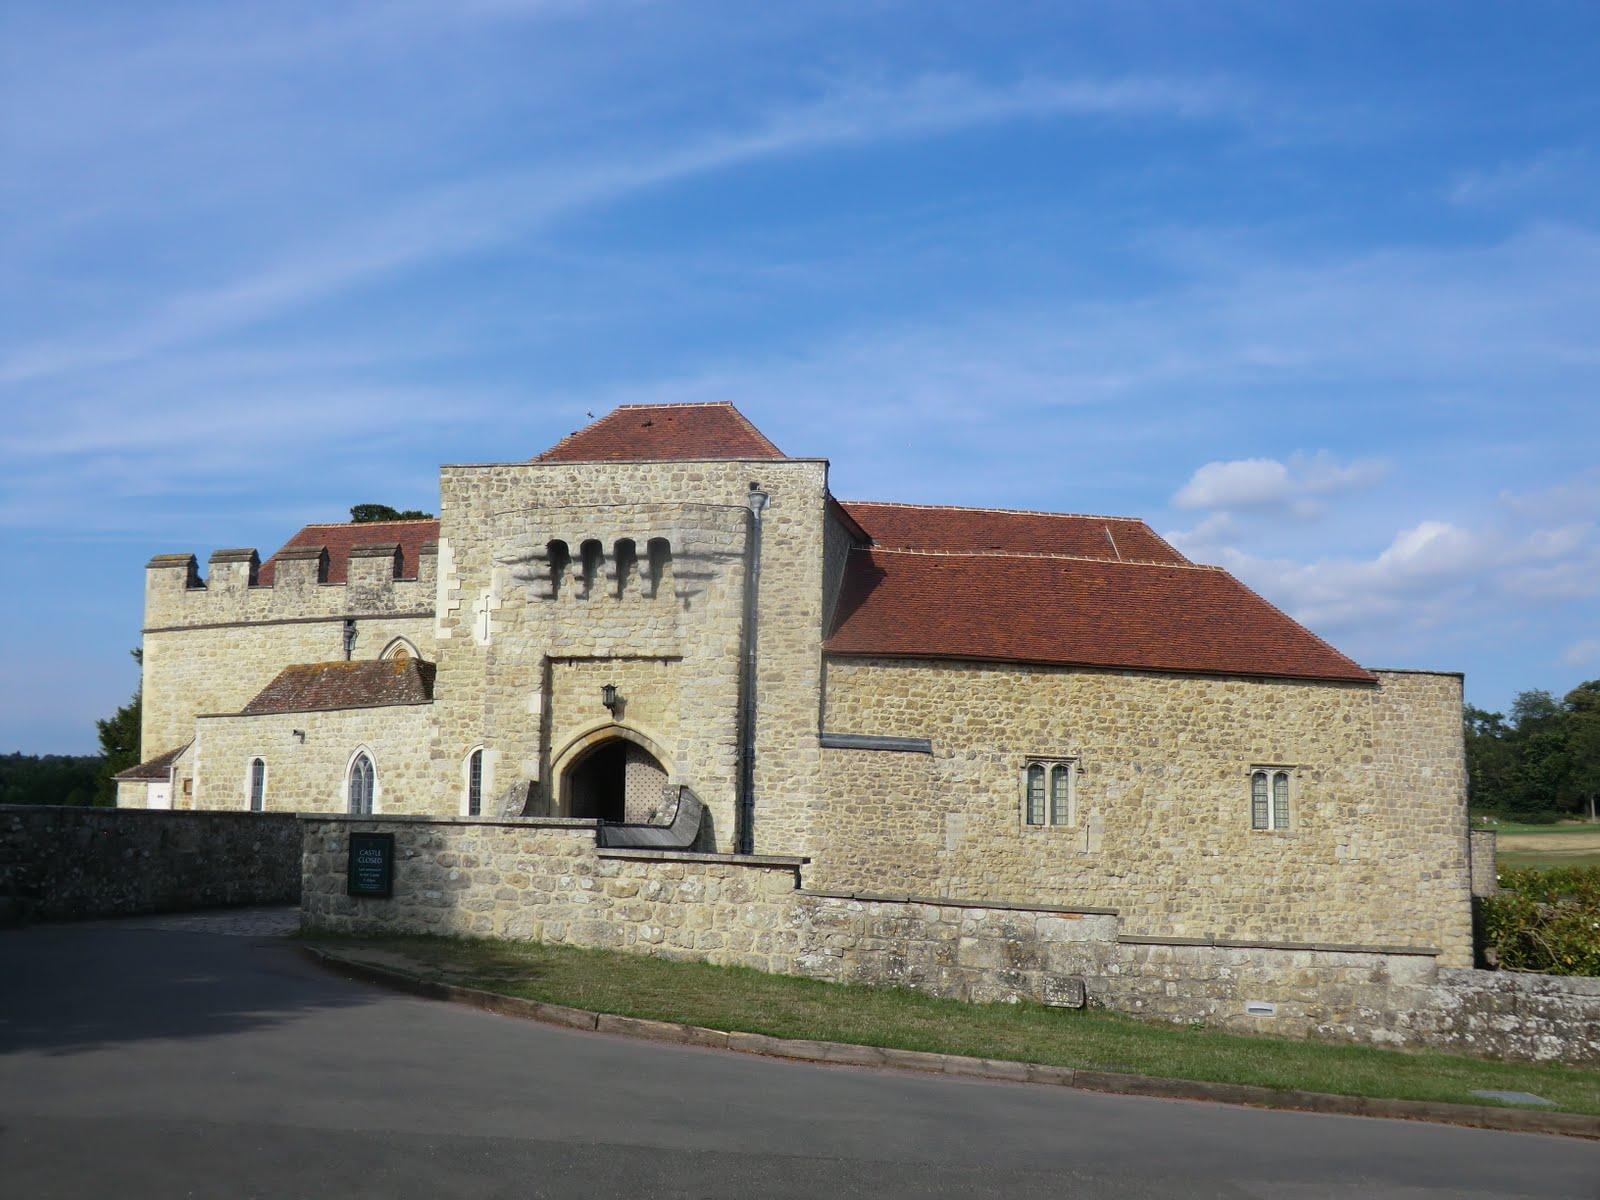 CIMG3040 Gatehouse, Leeds Castle